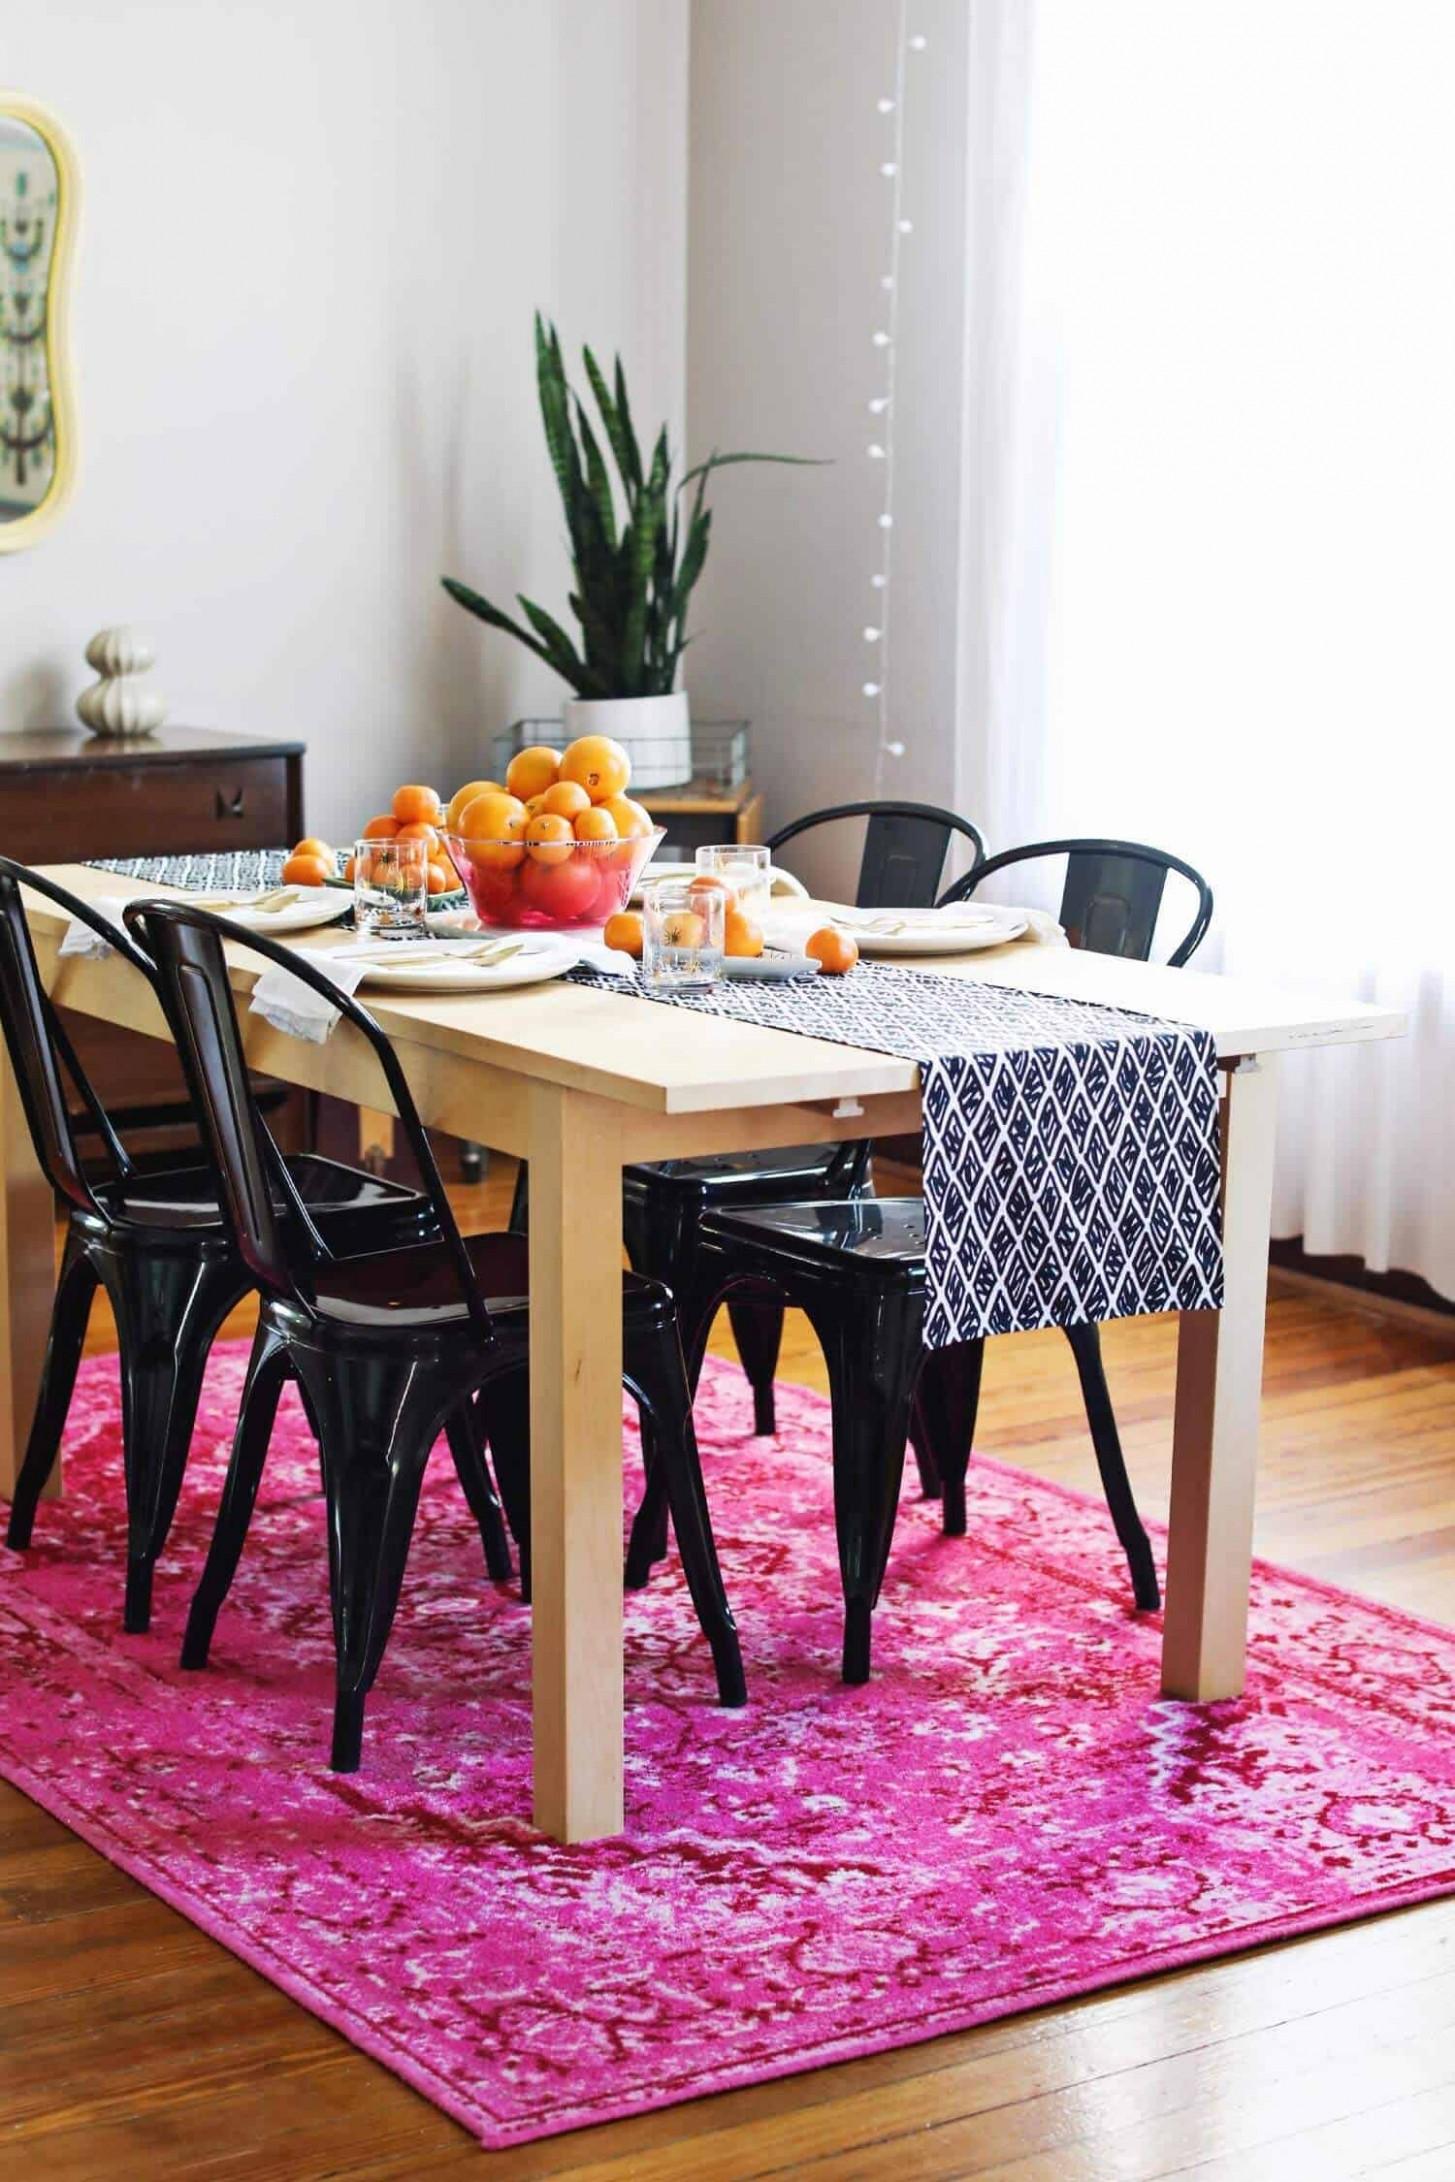 DIY Modern Table Runner - A Beautiful Mess - Dining Room Runner Ideas